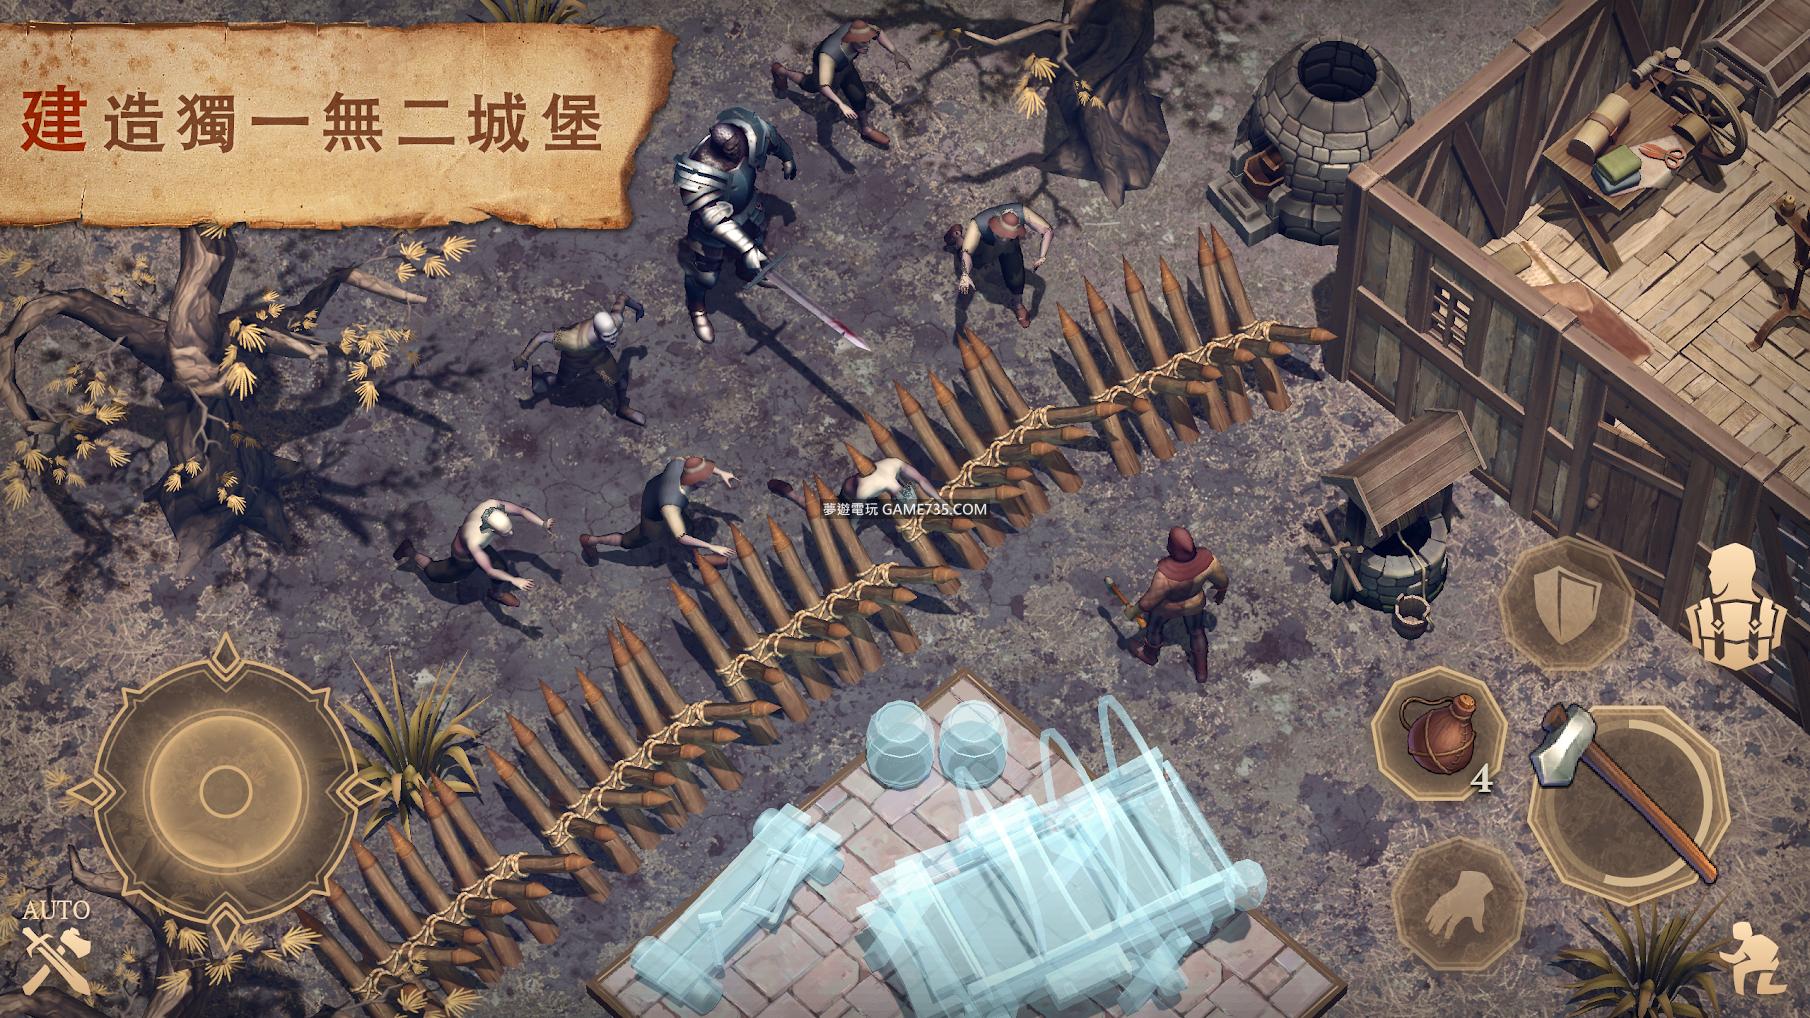 [修改版][生存+冷酷靈魂]Grim Soul: Dark Fantasy Survival V2.7.6 多種修改+中文